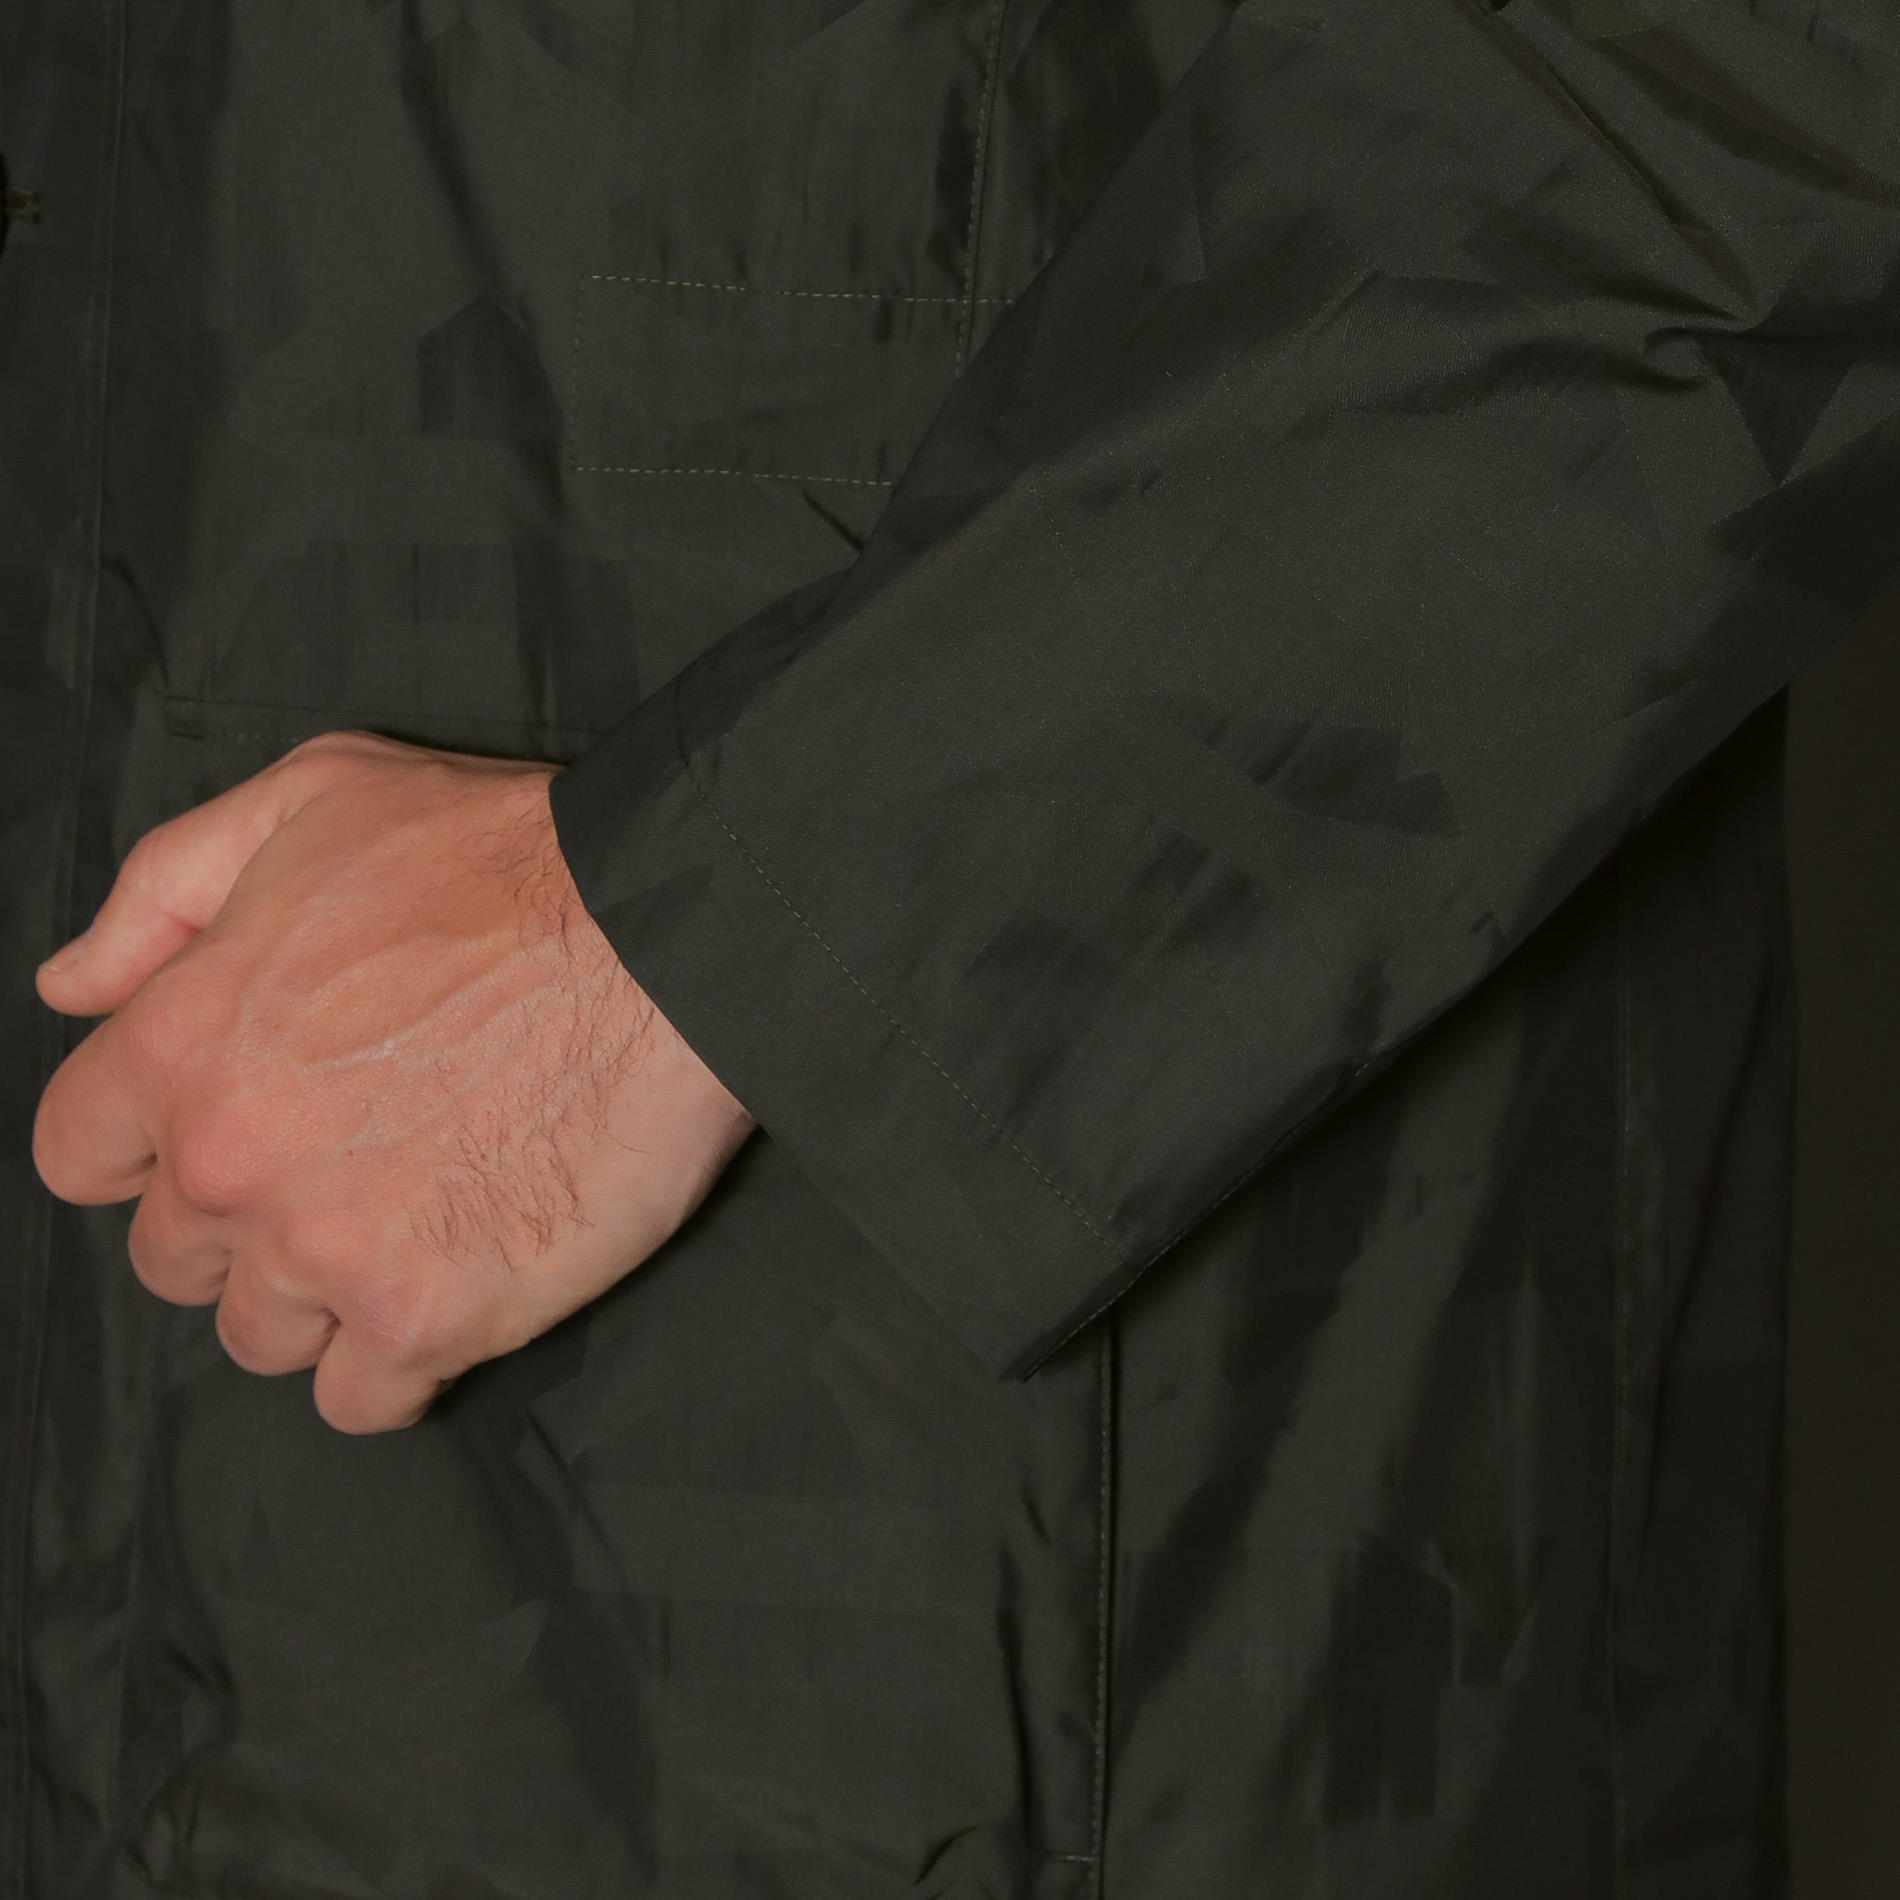 ◆◆【BERWICK】アンドリューカモフラージュジャガードパーカー